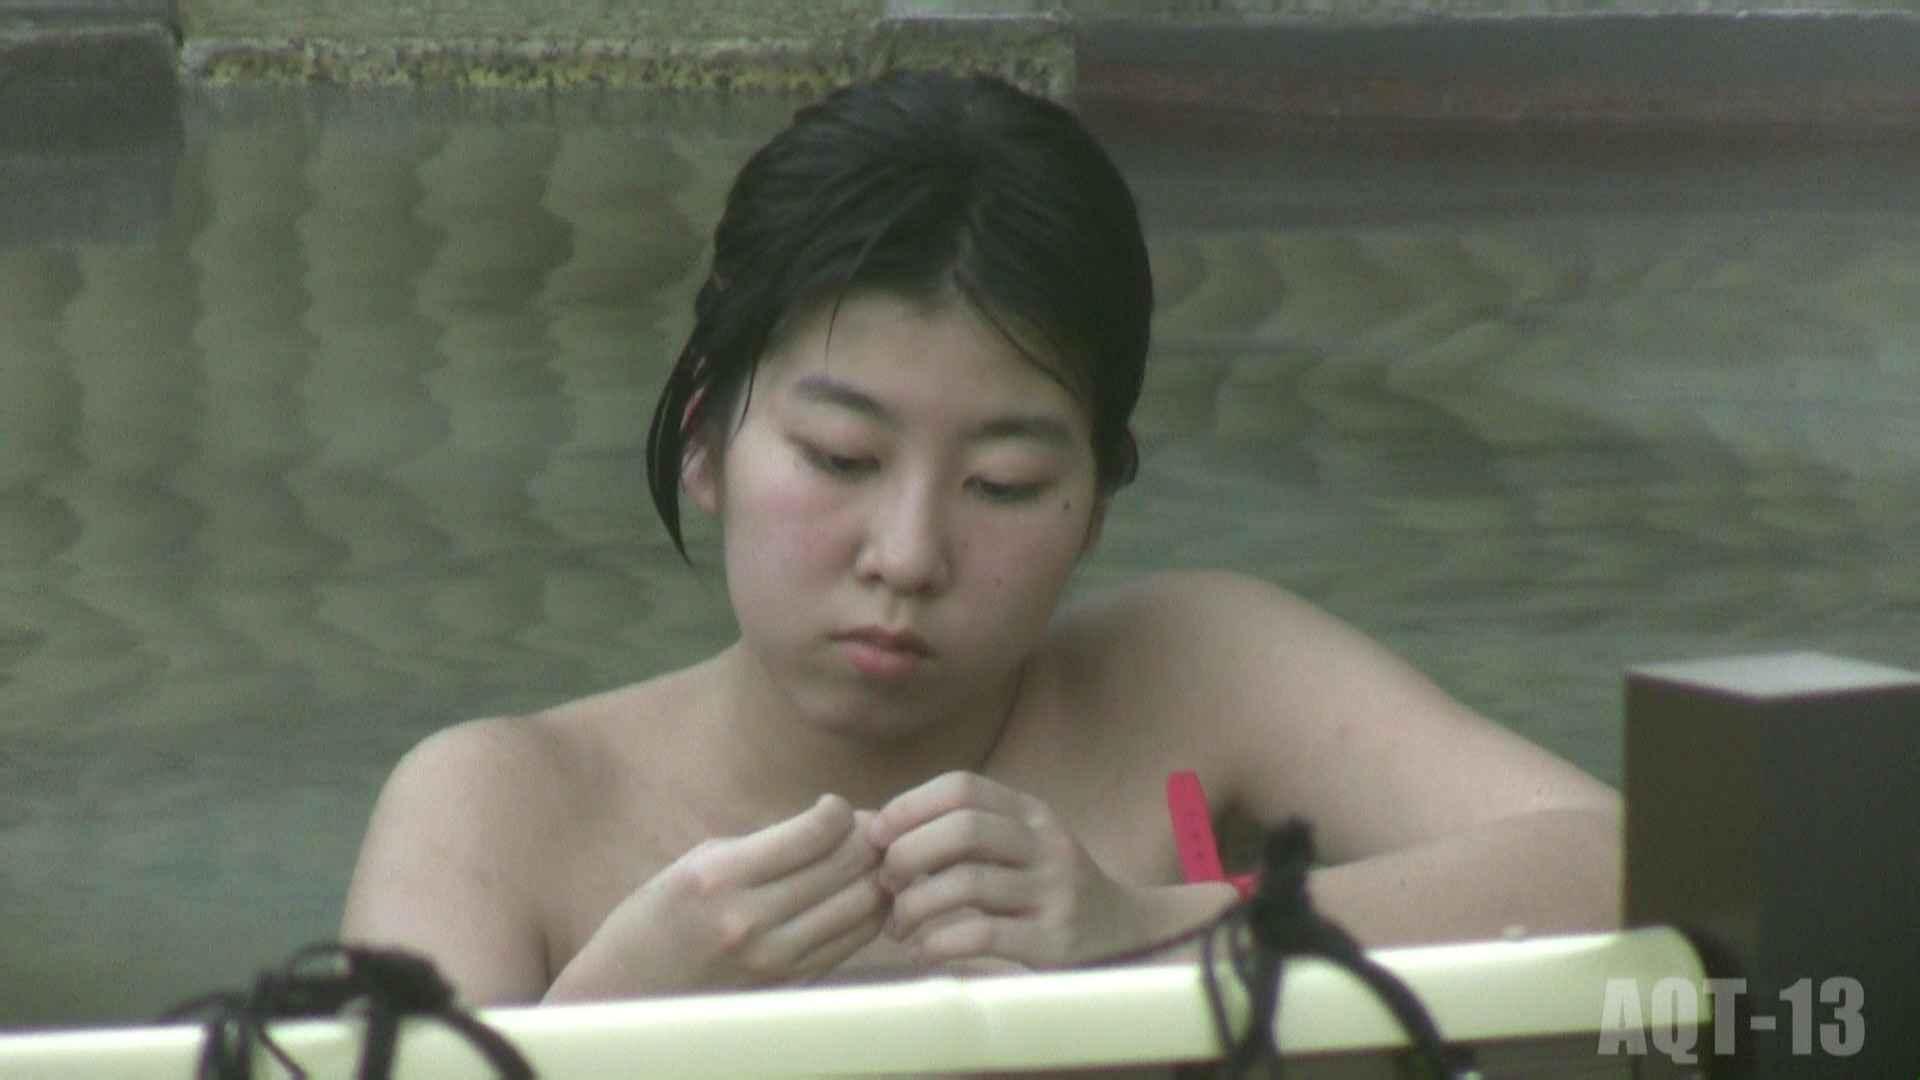 Aquaな露天風呂Vol.816 OLセックス | 露天  80画像 58